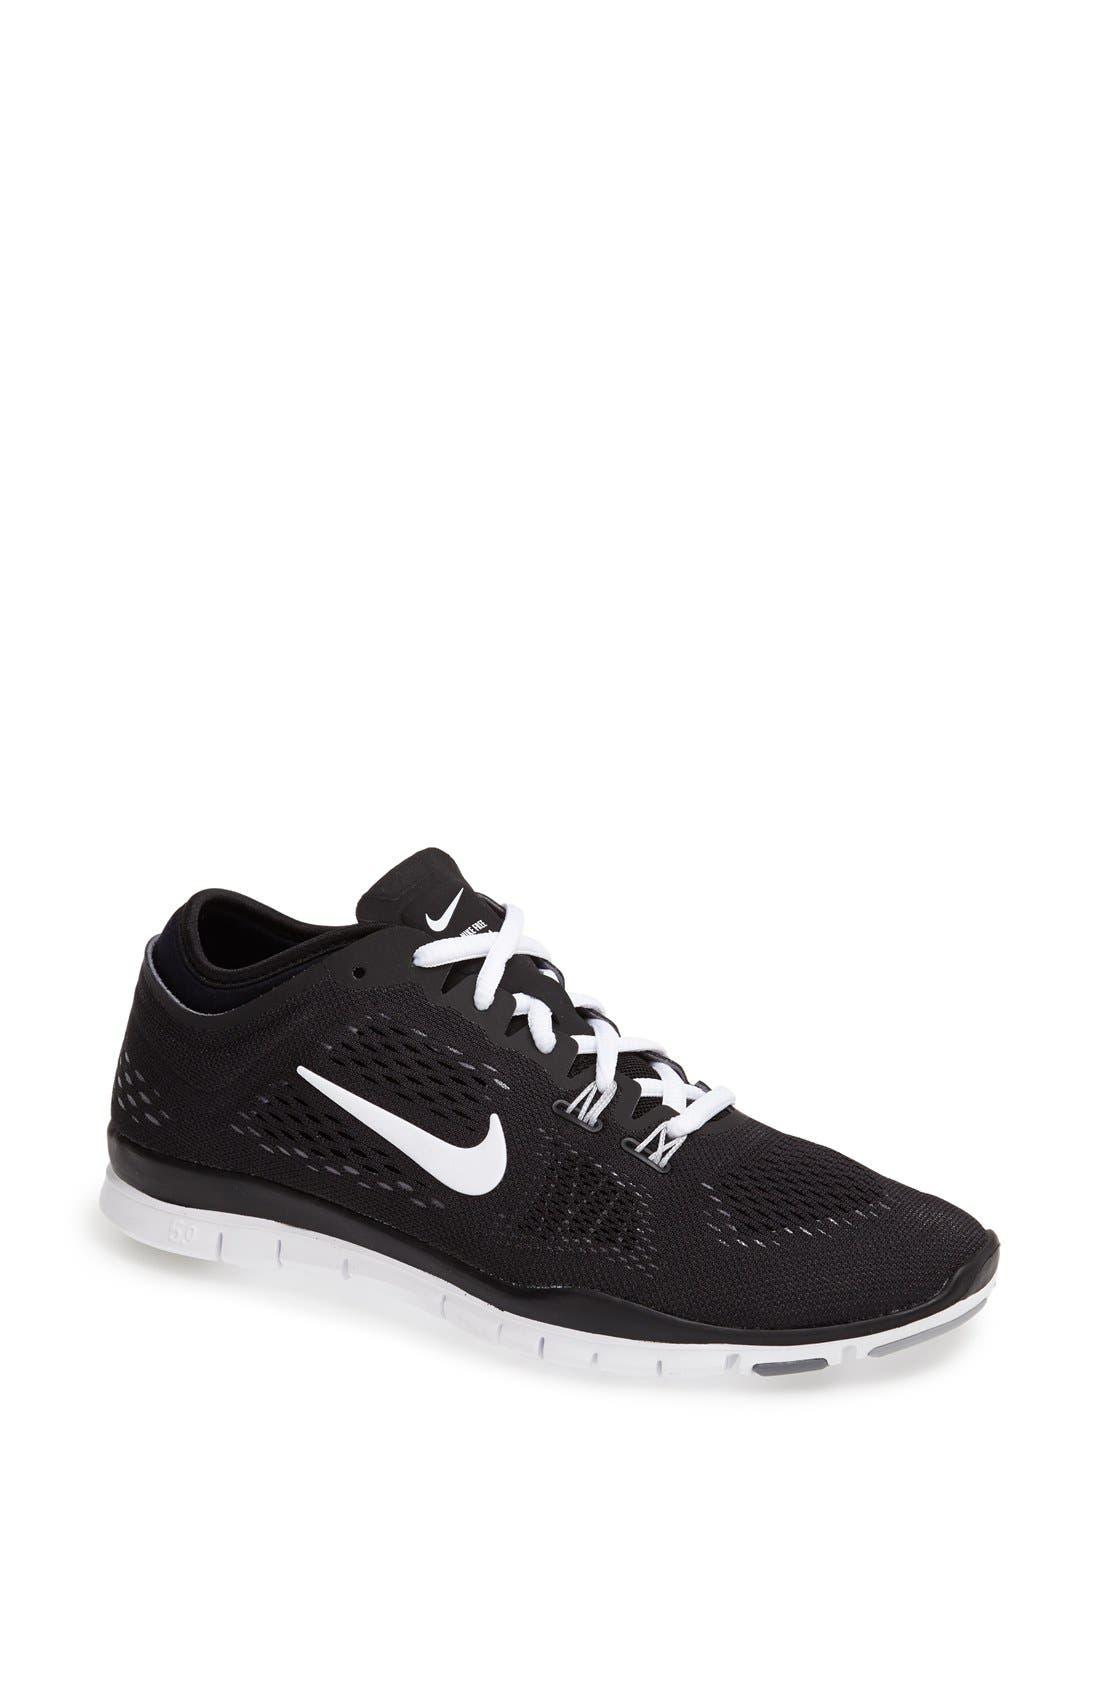 Main Image - Nike 'Free 5.0 TR Fit 4' Training Shoe (Women)